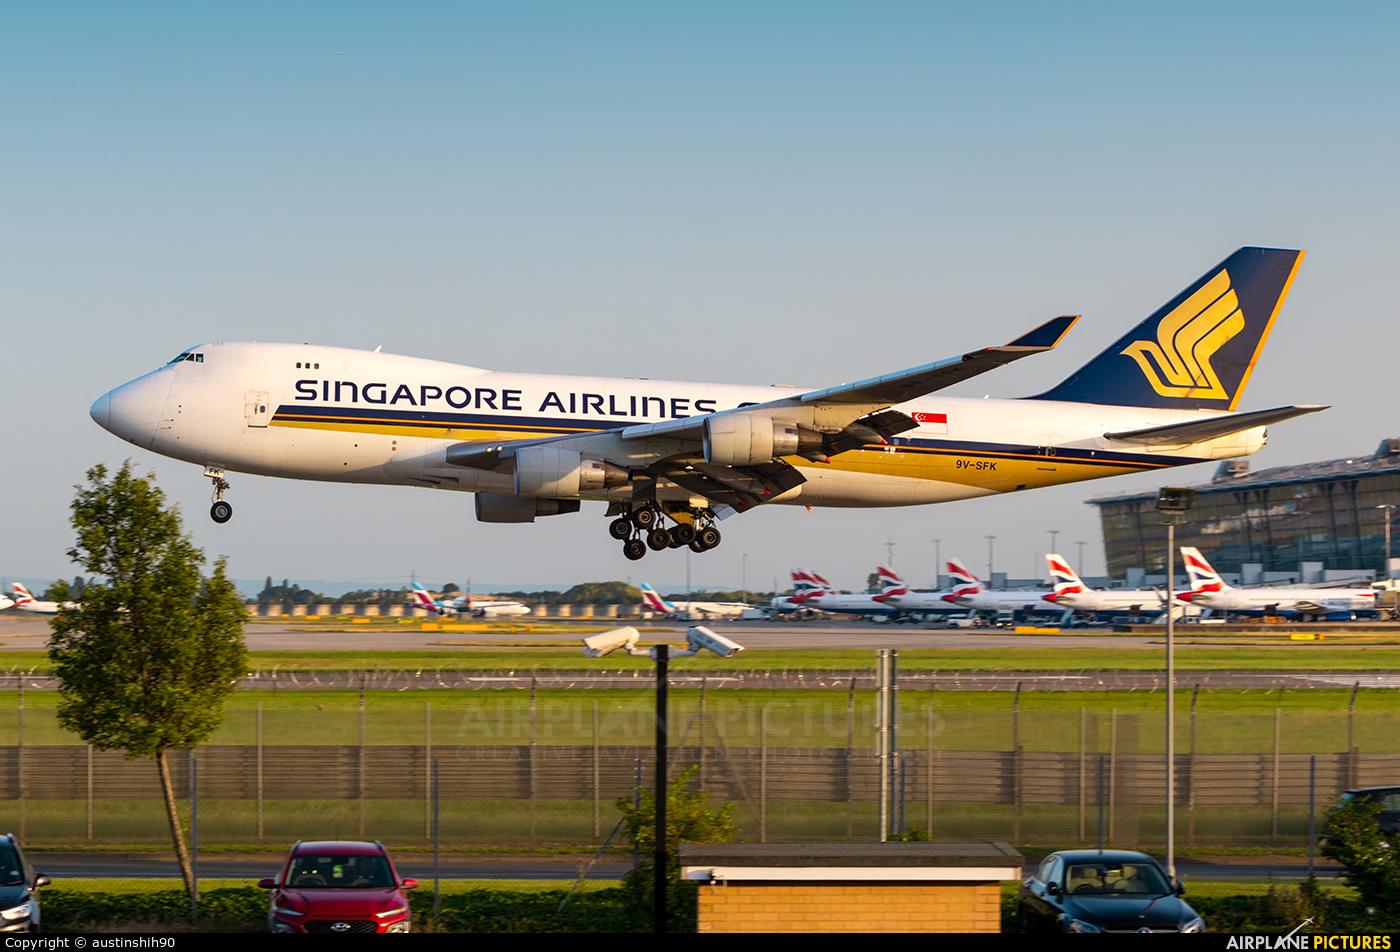 Singapore Airlines Cargo 9V-SFK aircraft at London - Heathrow